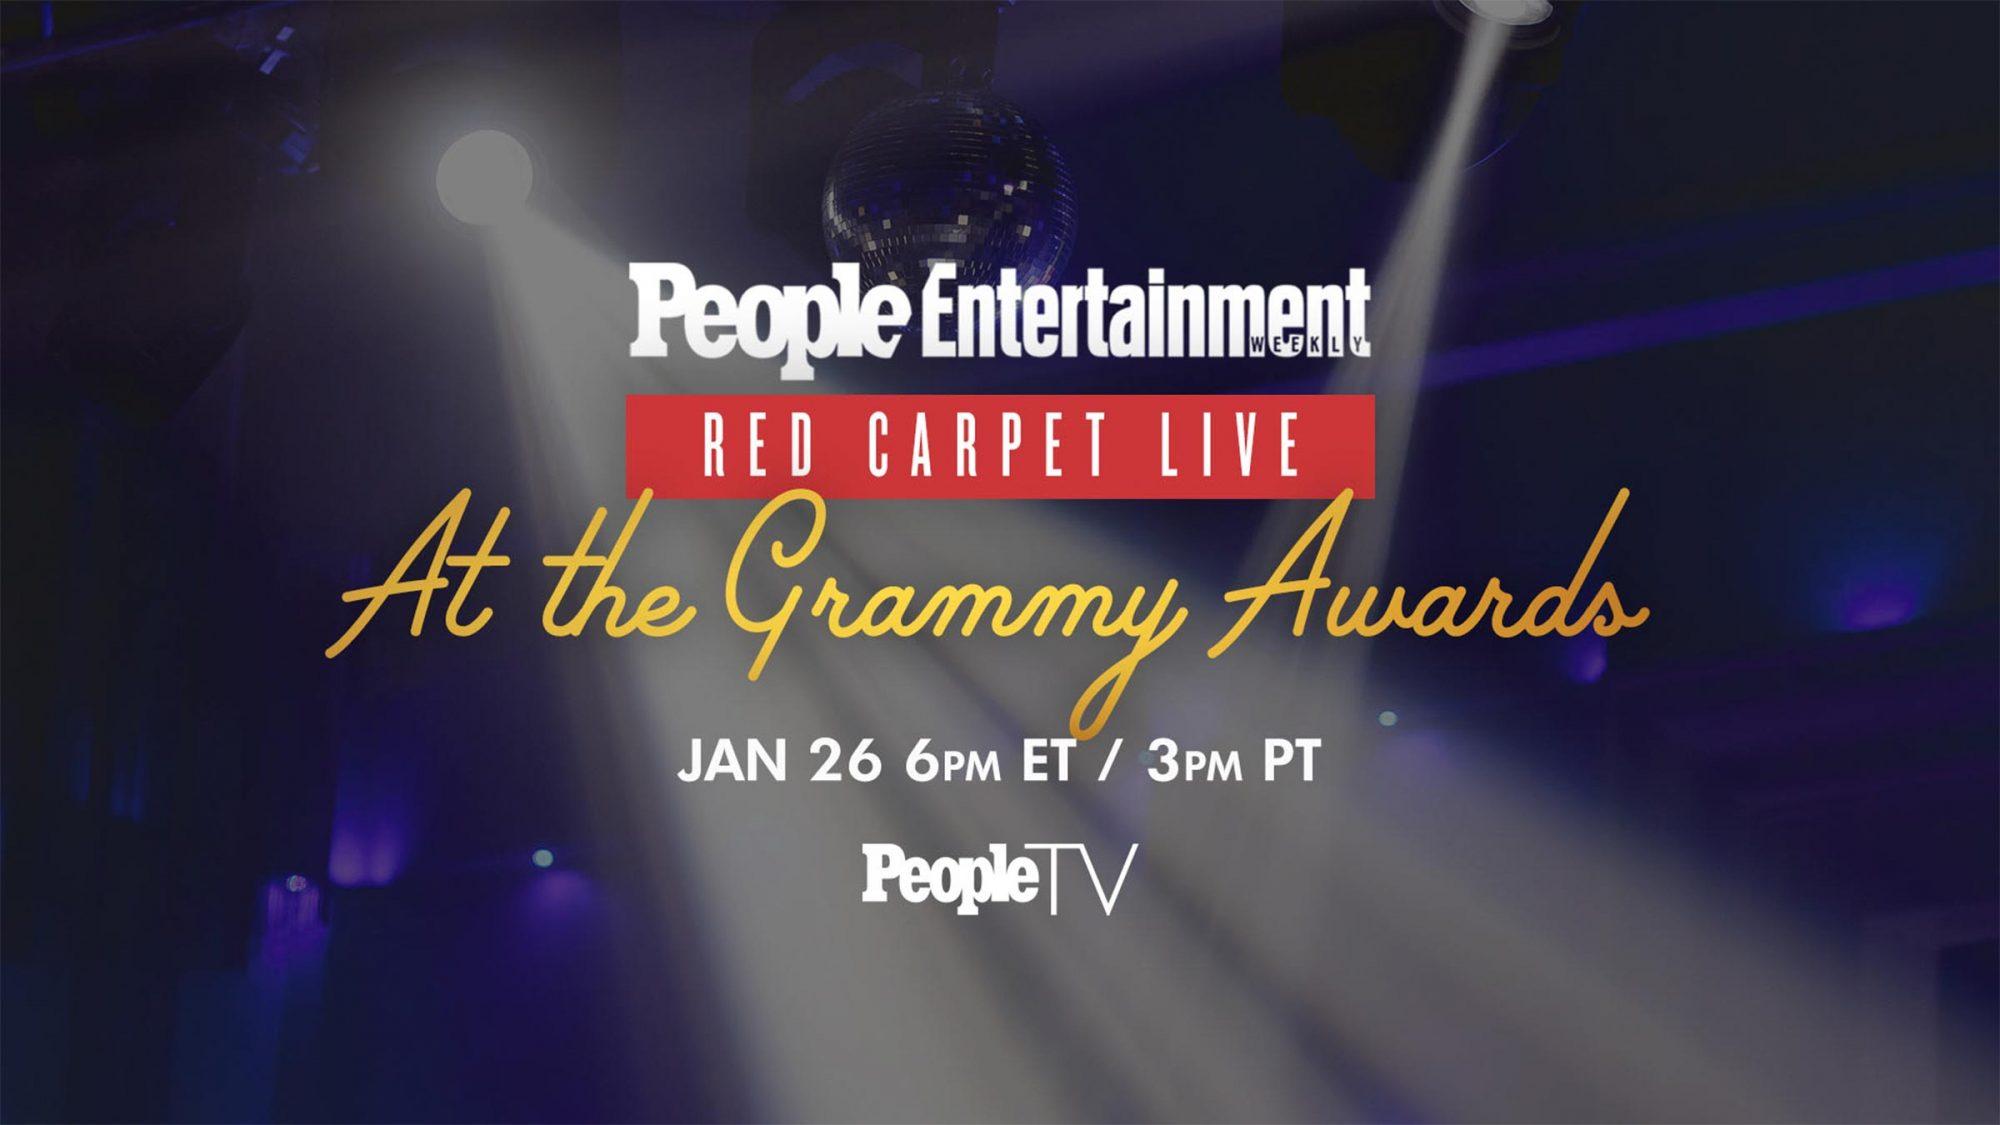 Grammy Awards Livestream